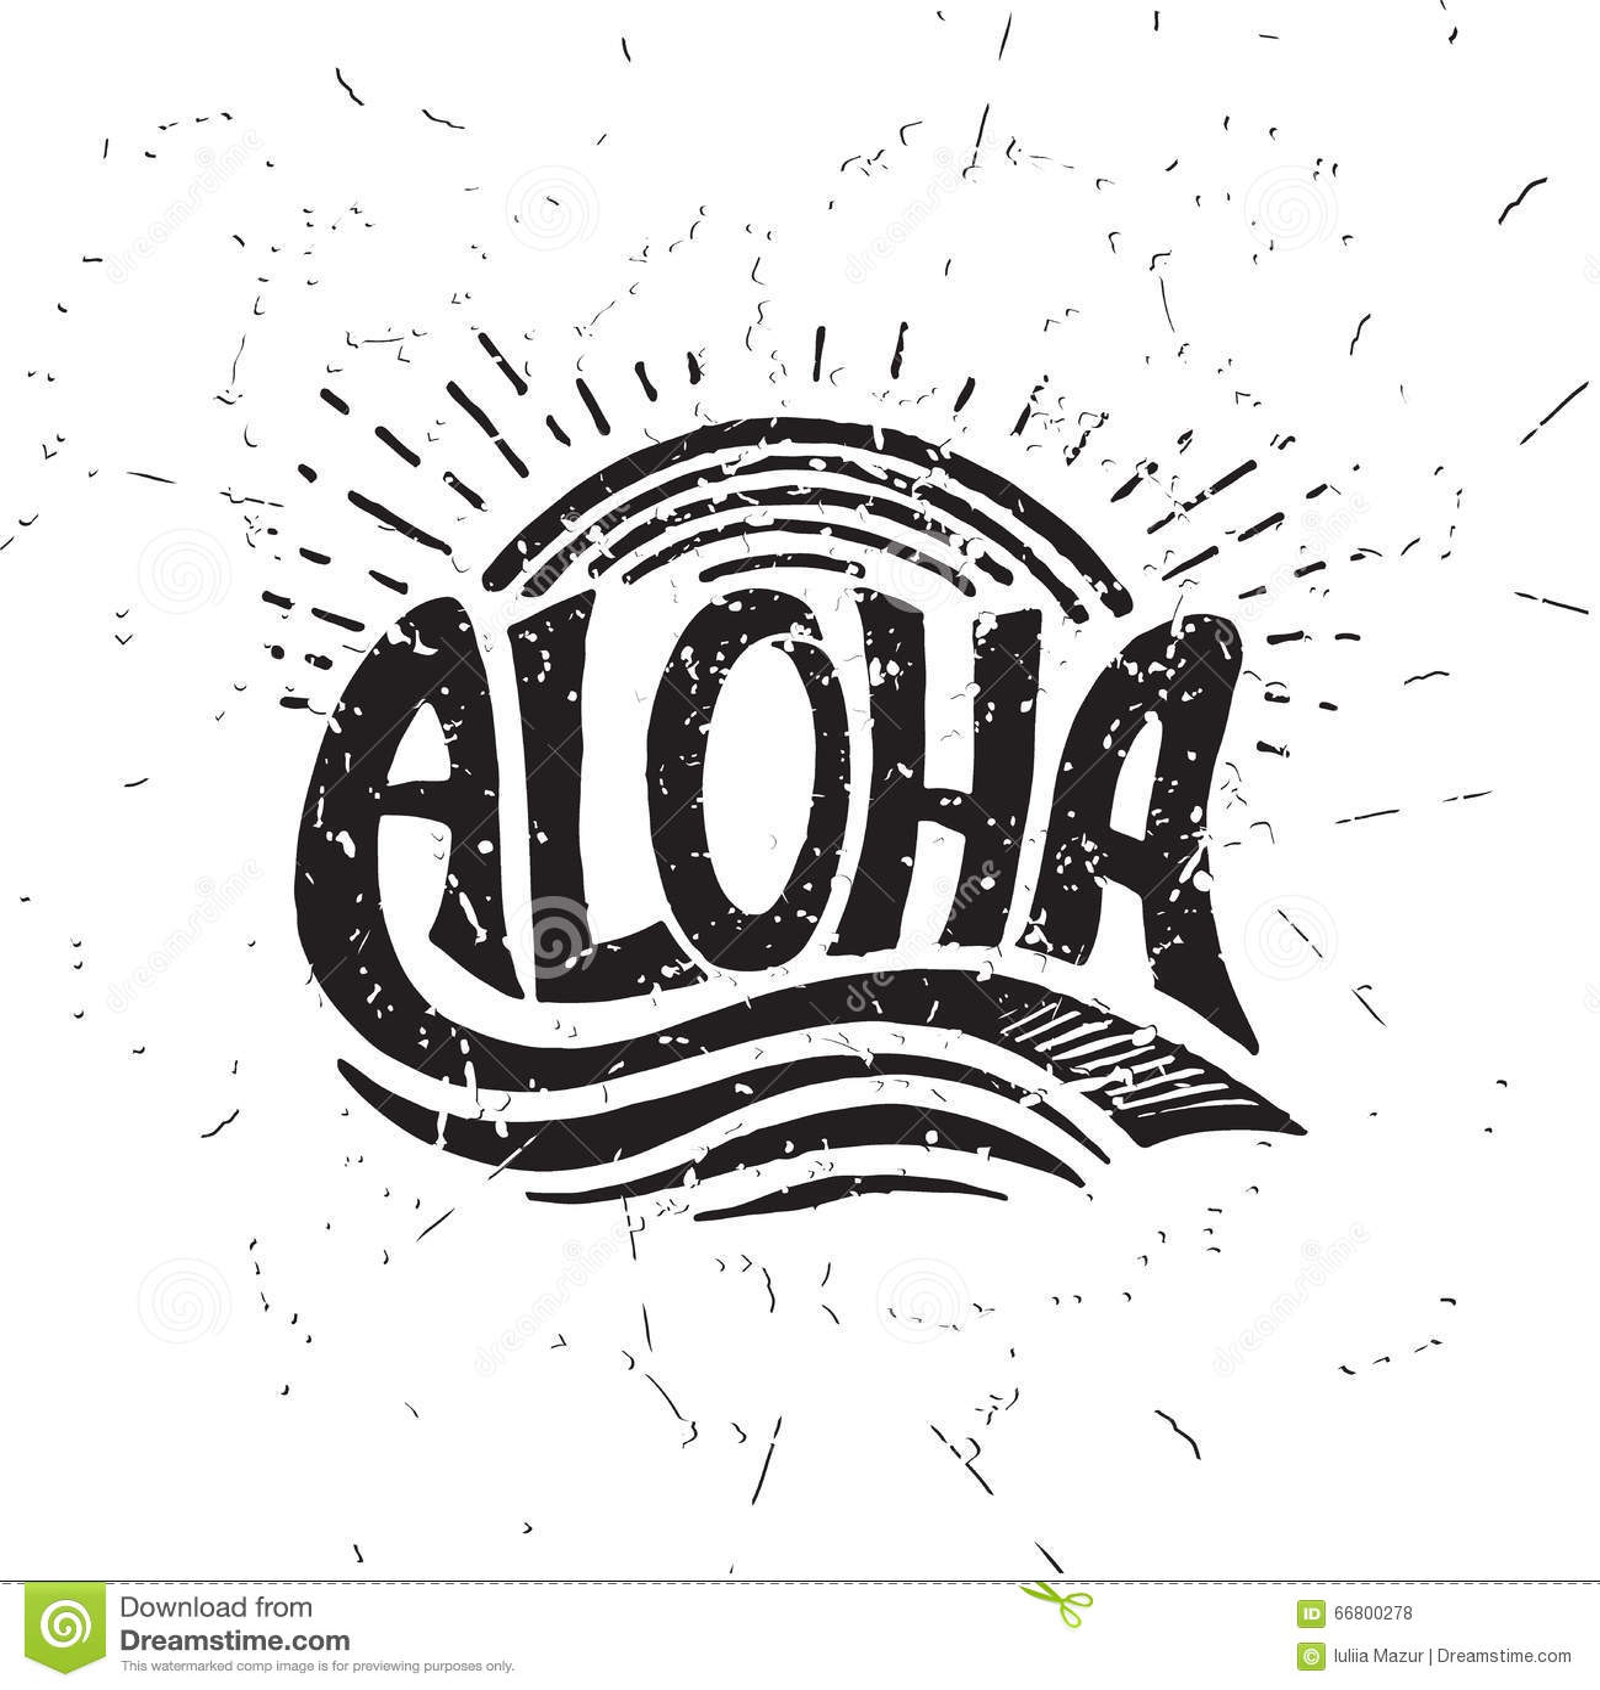 Aloha Vector Illustration Of Tiki Mask With Surf Boards